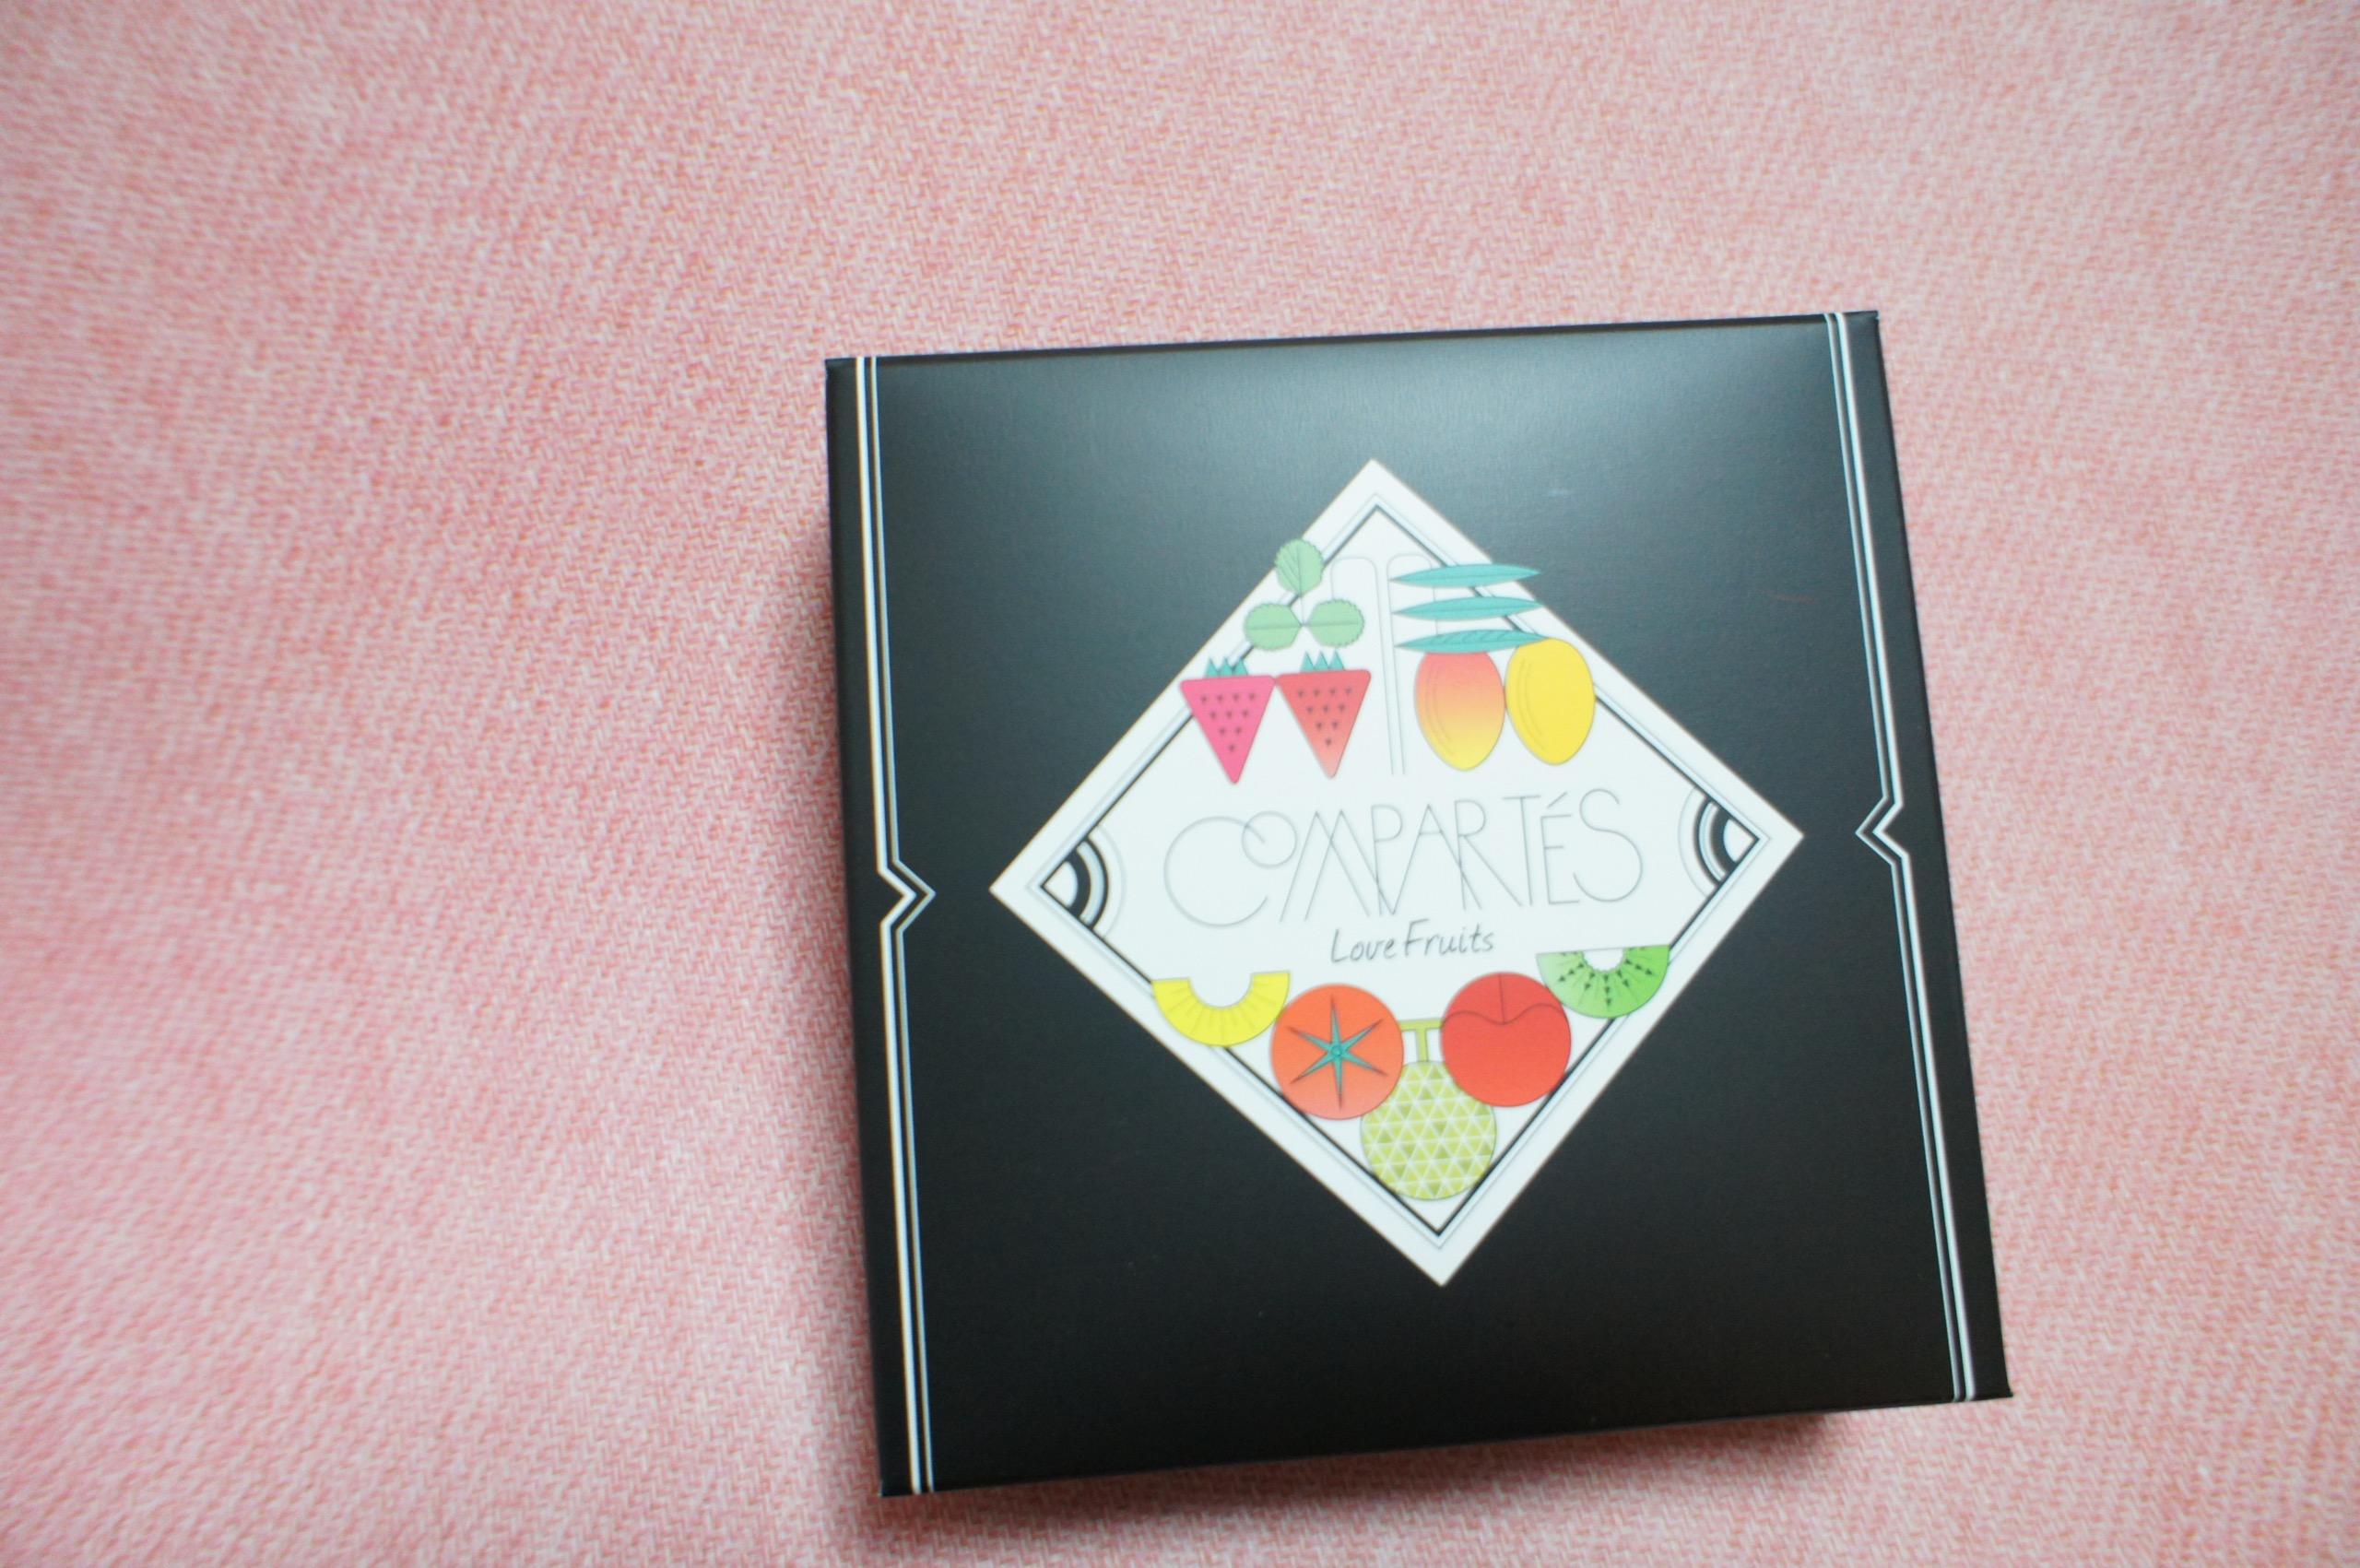 《ALL ¥1,000以下❤️》大丸東京店で買える【バレンタイン】おすすめチョコ3選☻!_3